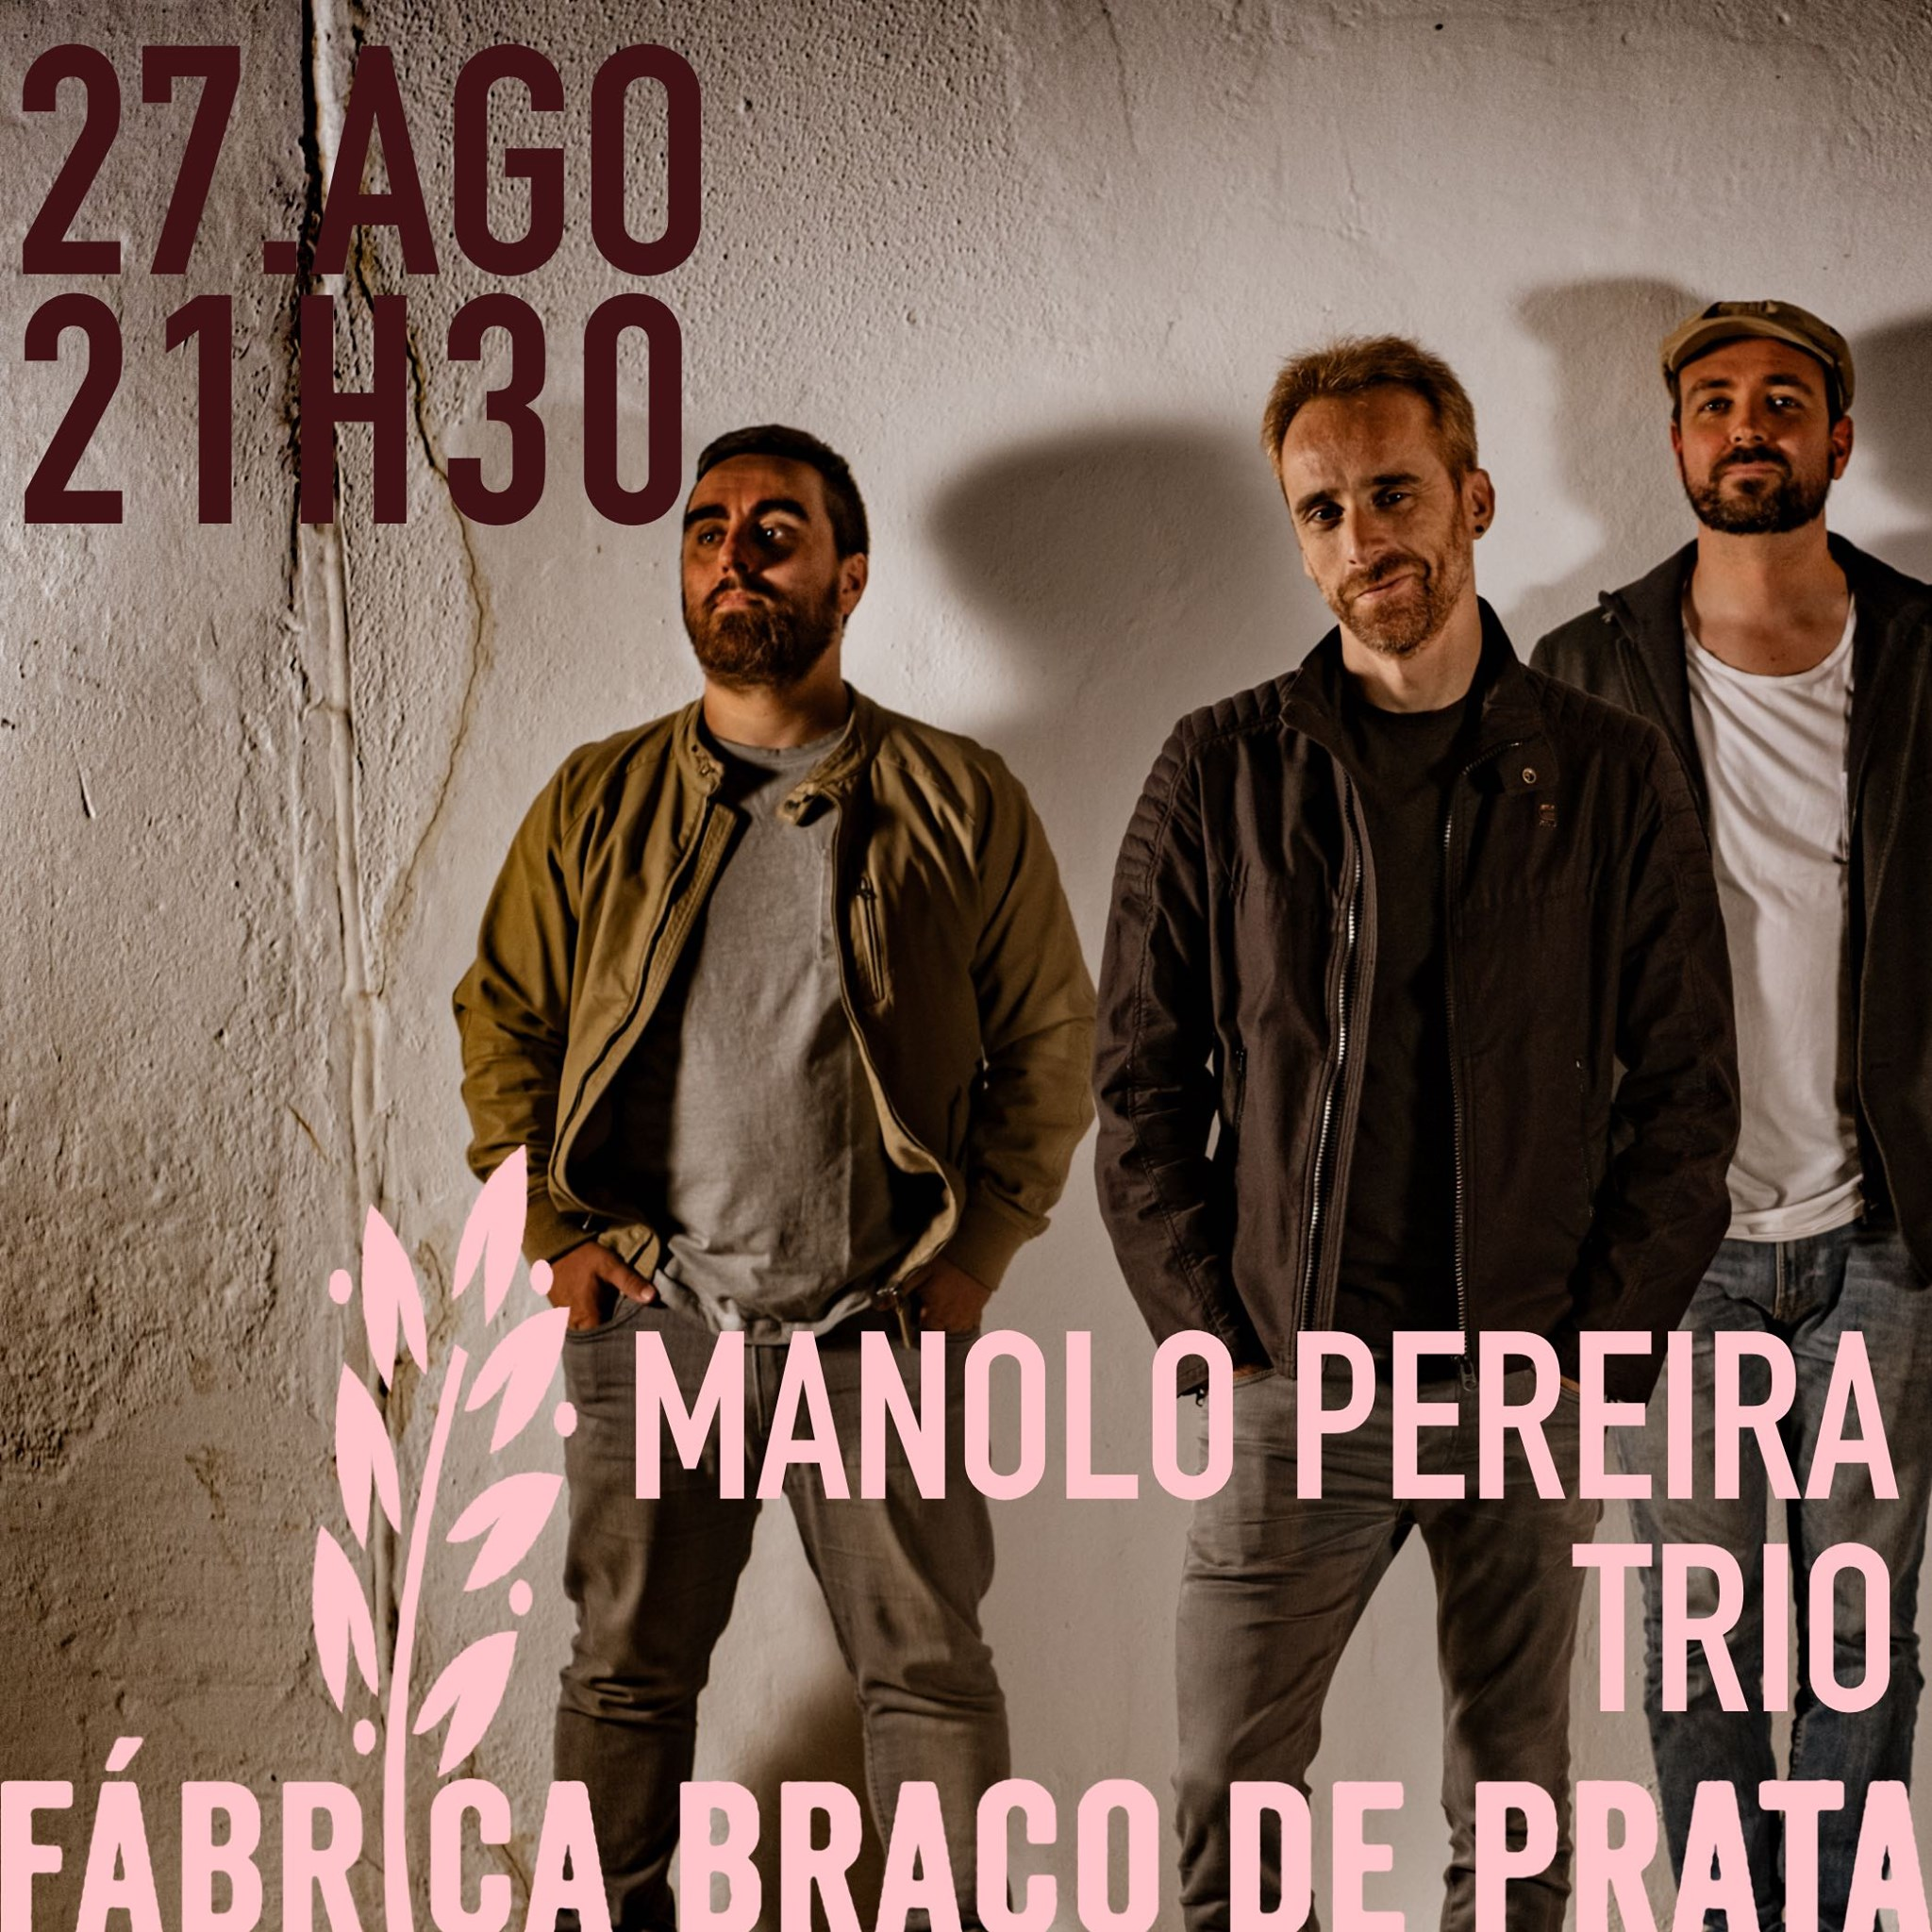 Manolo Pereira Trio